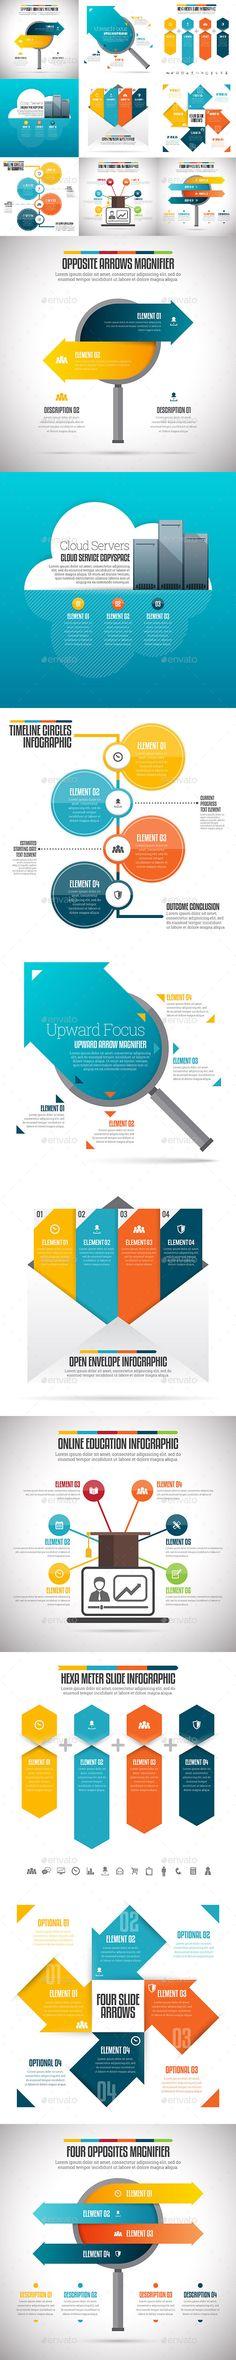 Infographic Set Template PSD, Vector EPS, AI #design Download: http://graphicriver.net/item/infographic-set-29/12999701?ref=ksioks